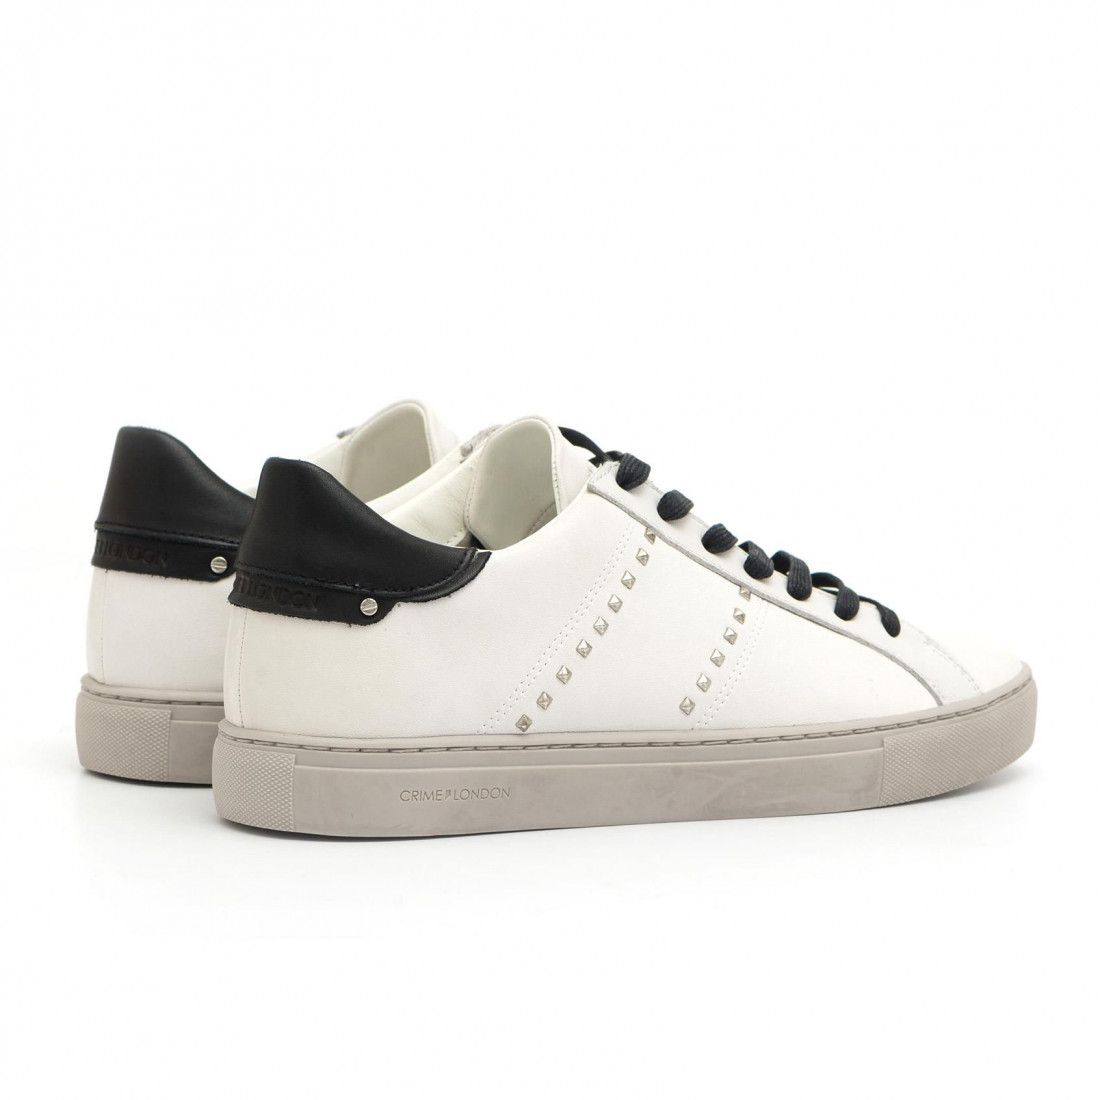 sneakers uomo crime london 1122110 2750